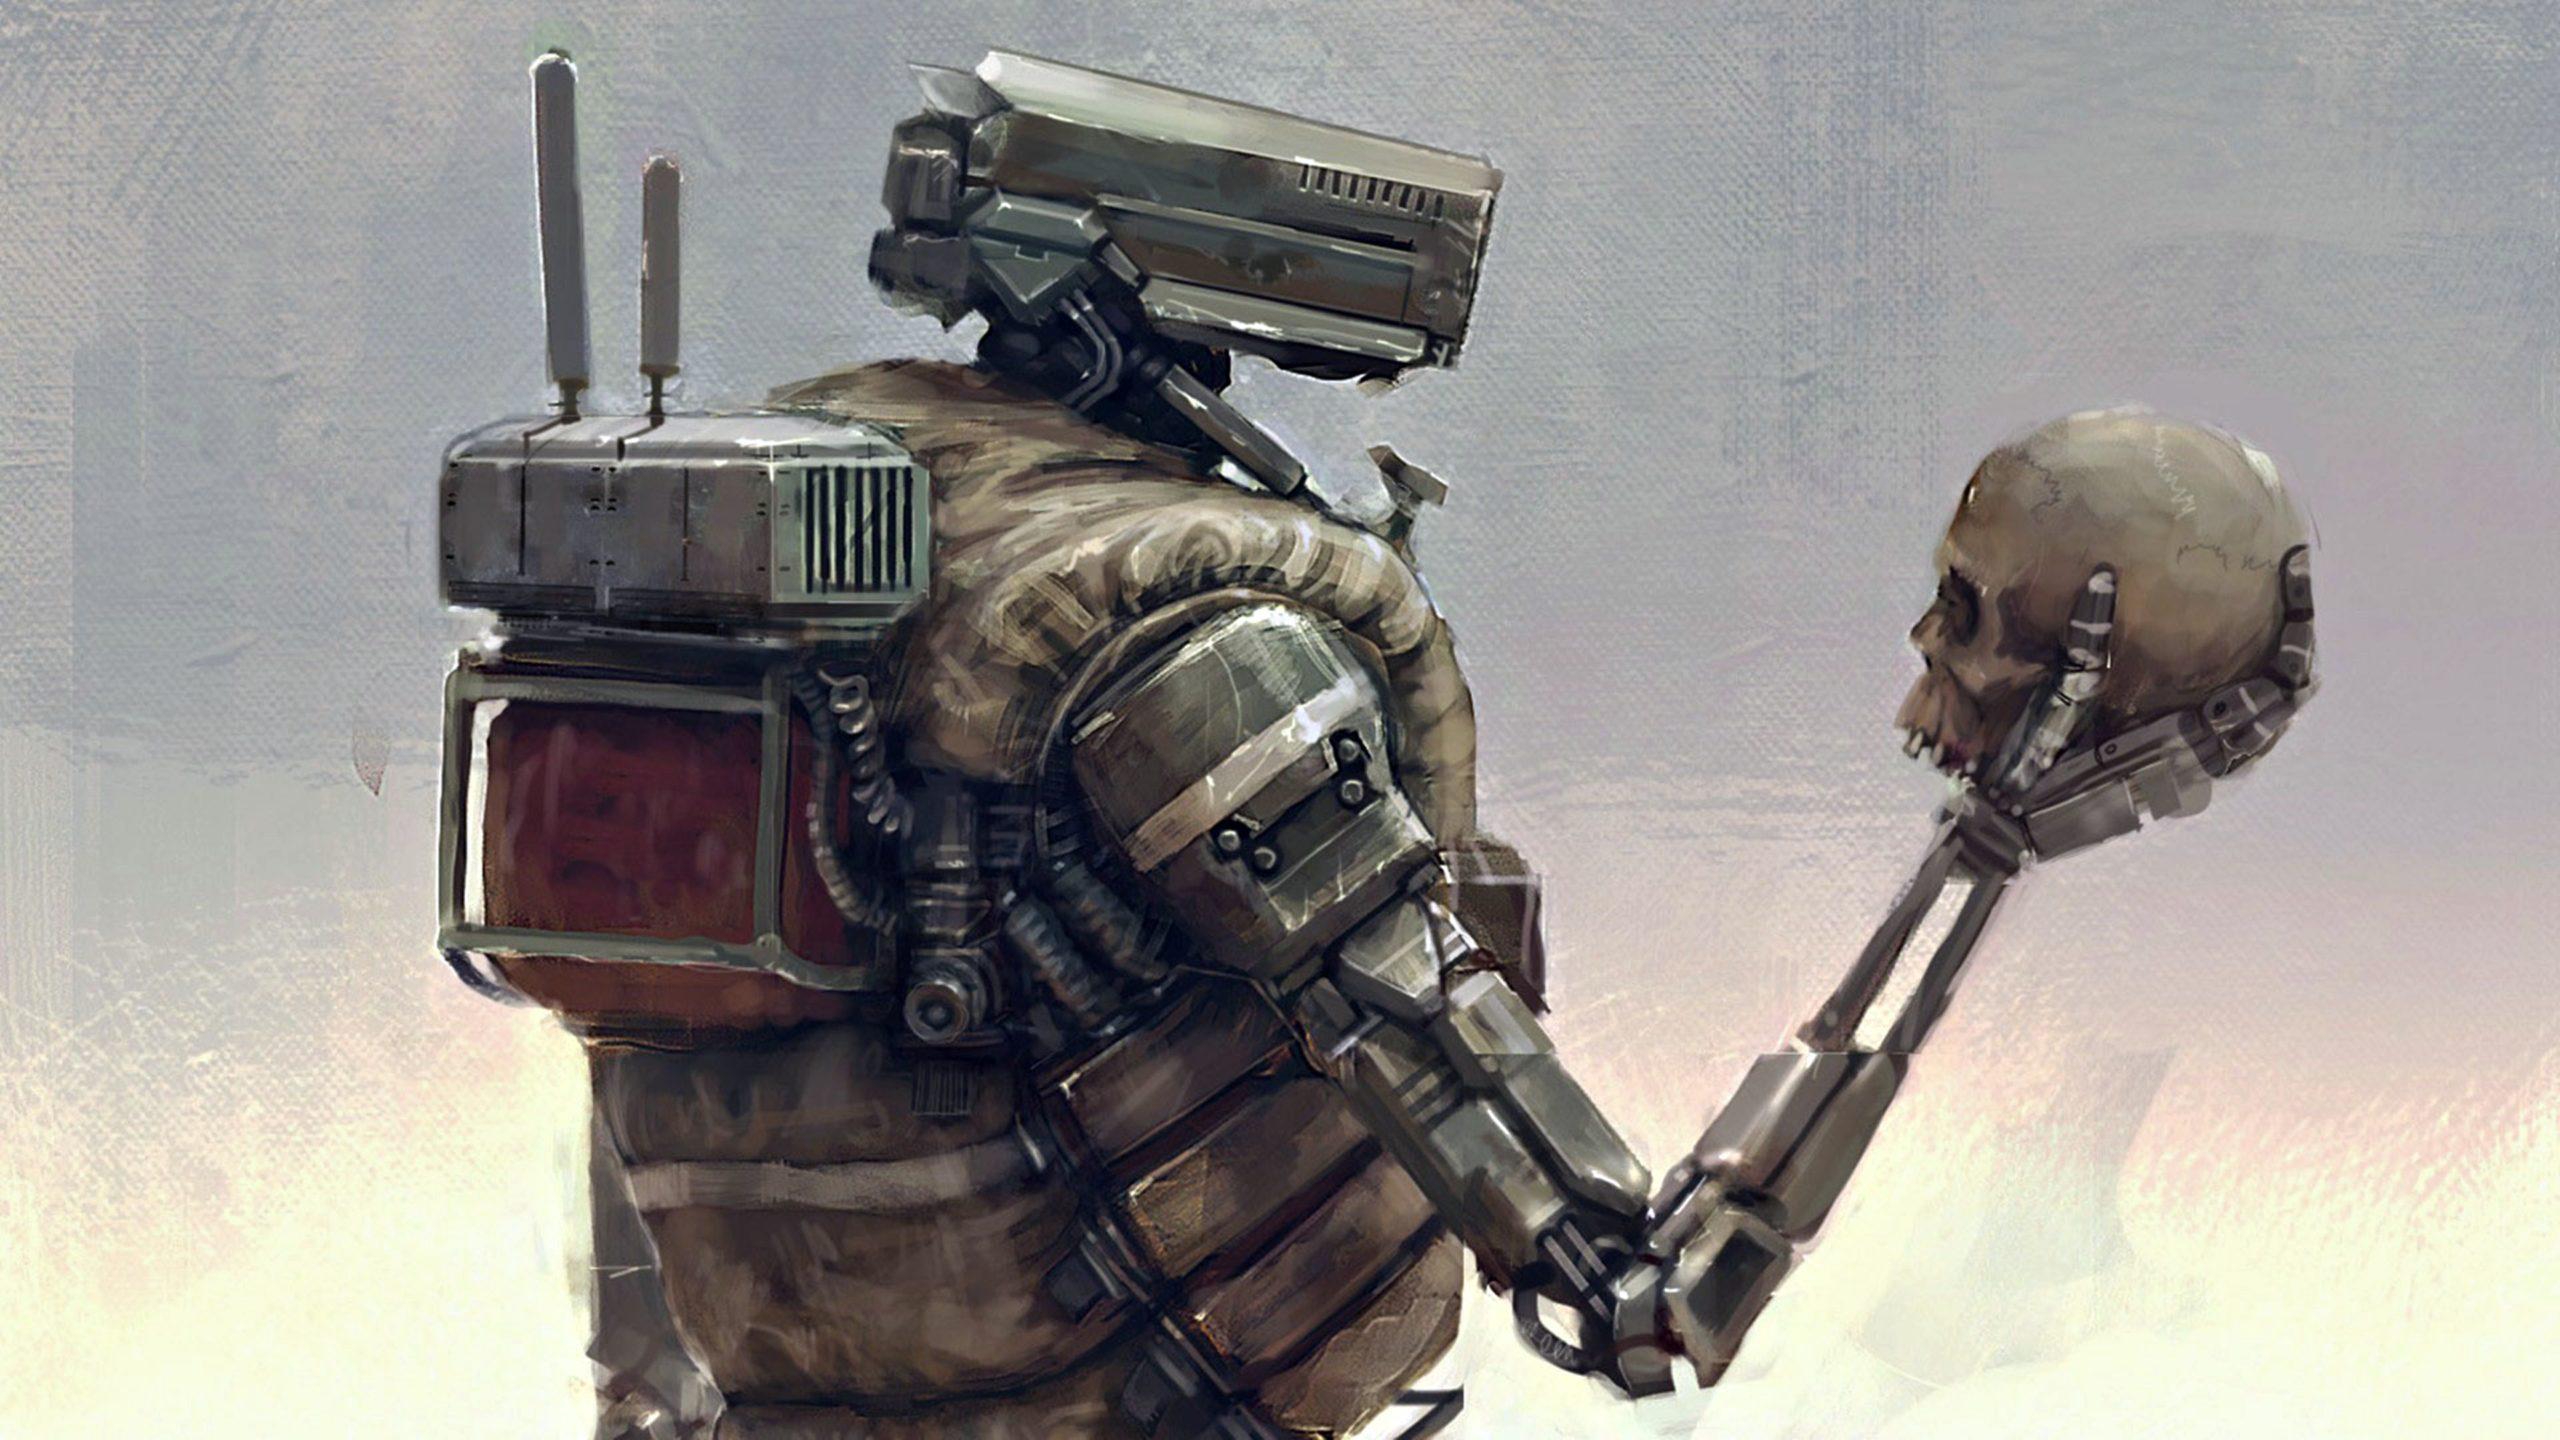 robot images free download